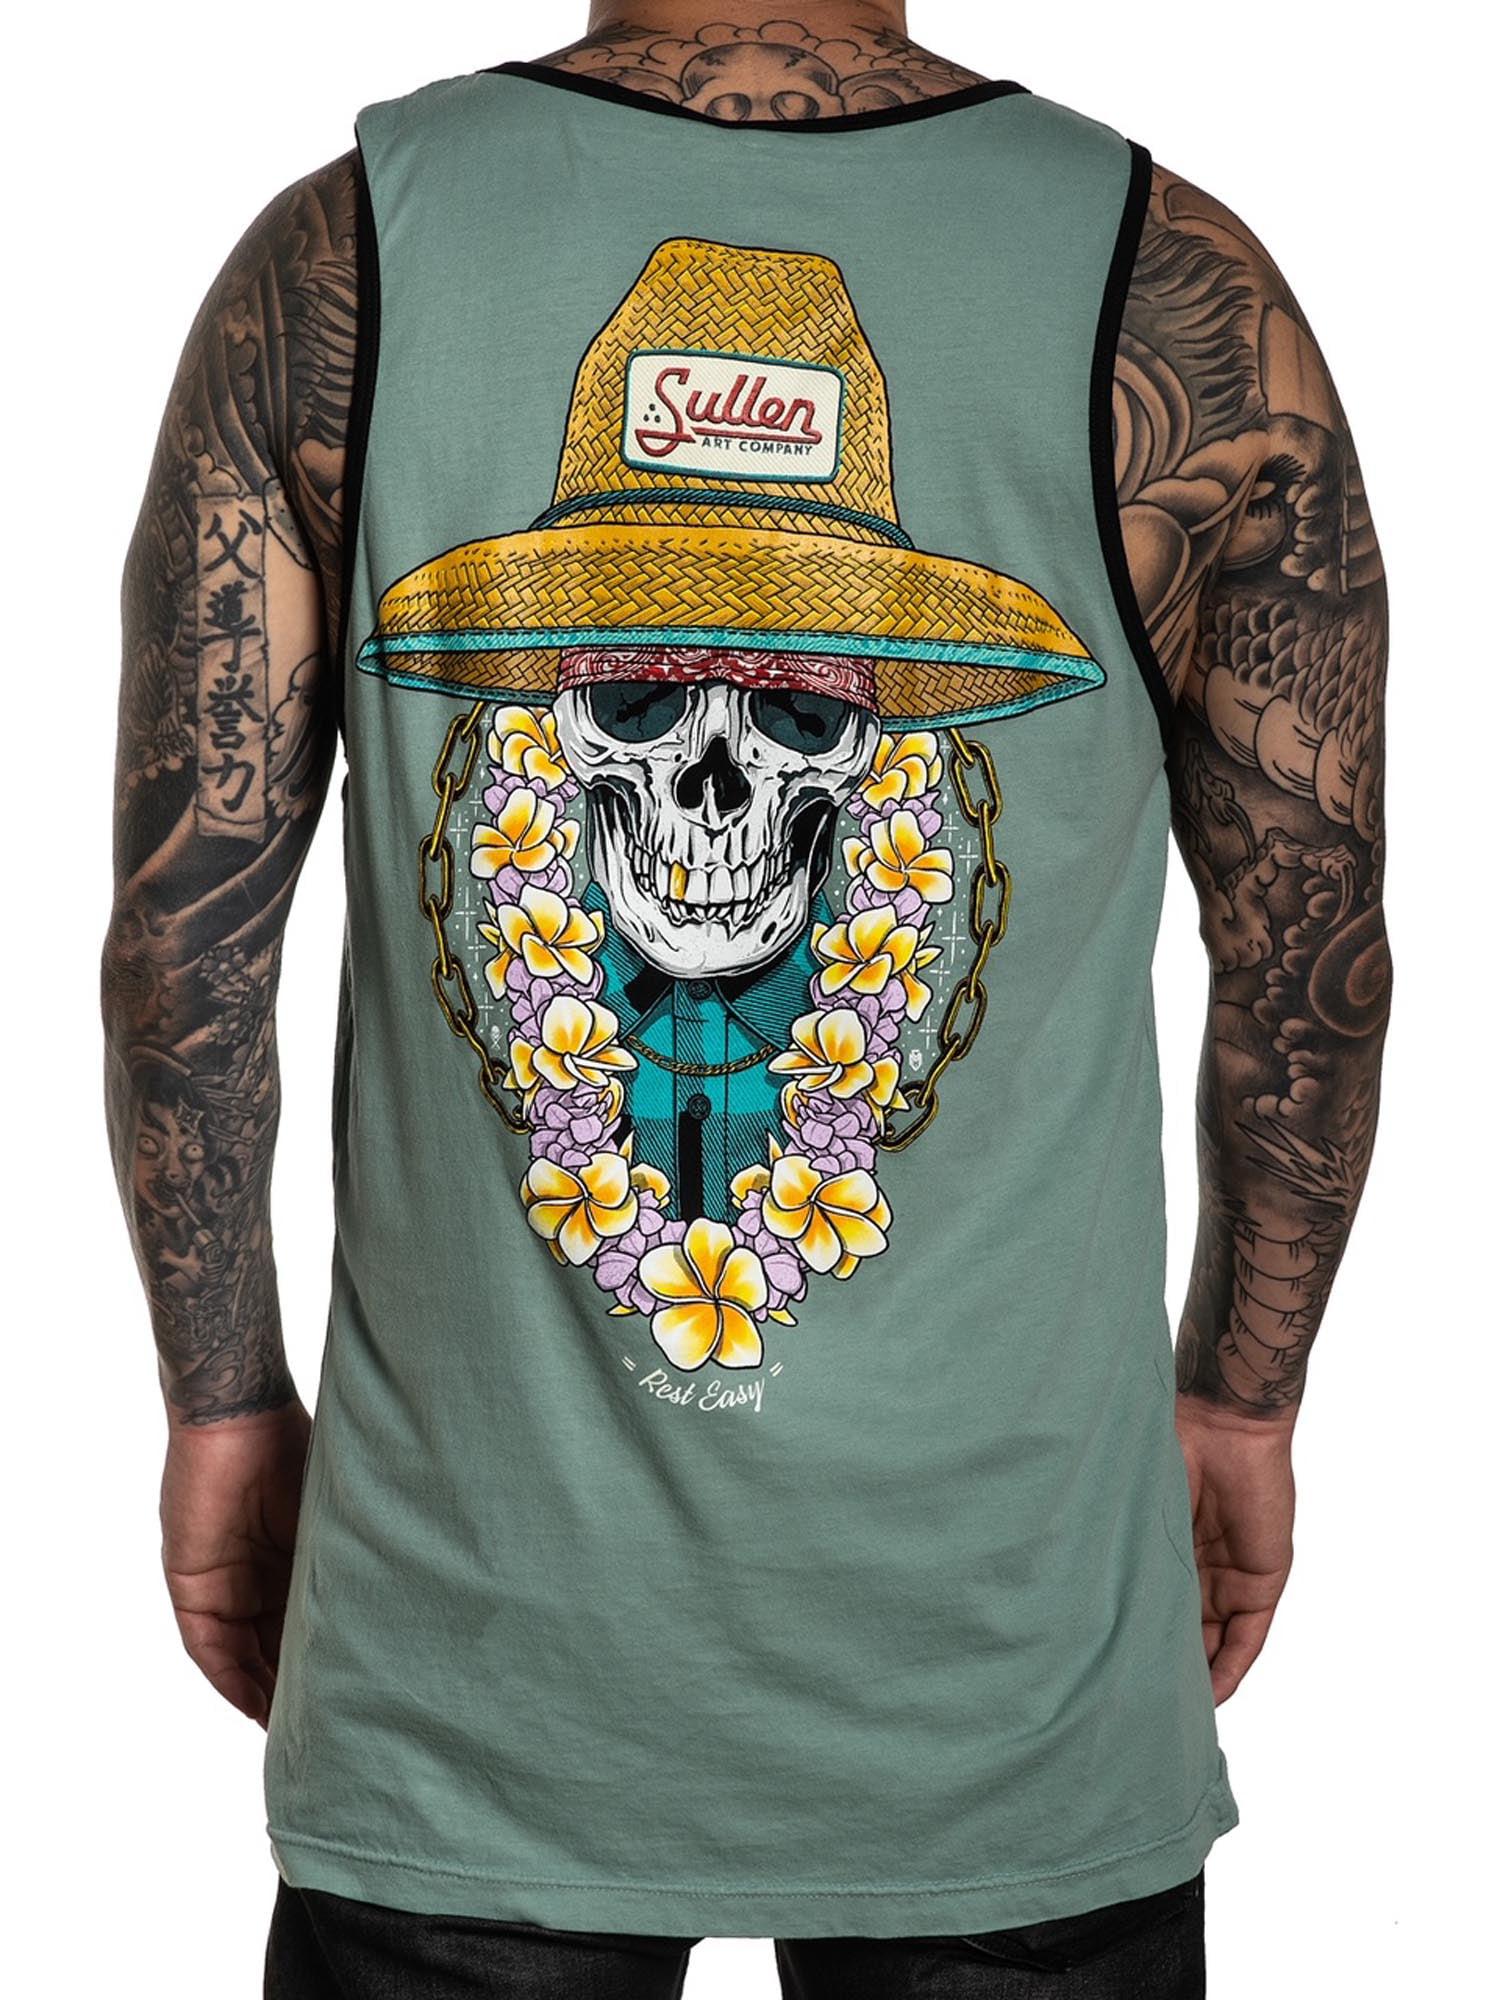 Sullen Men/'s Rest Easy Sleeveless Tank Top Shirt Beryl Green